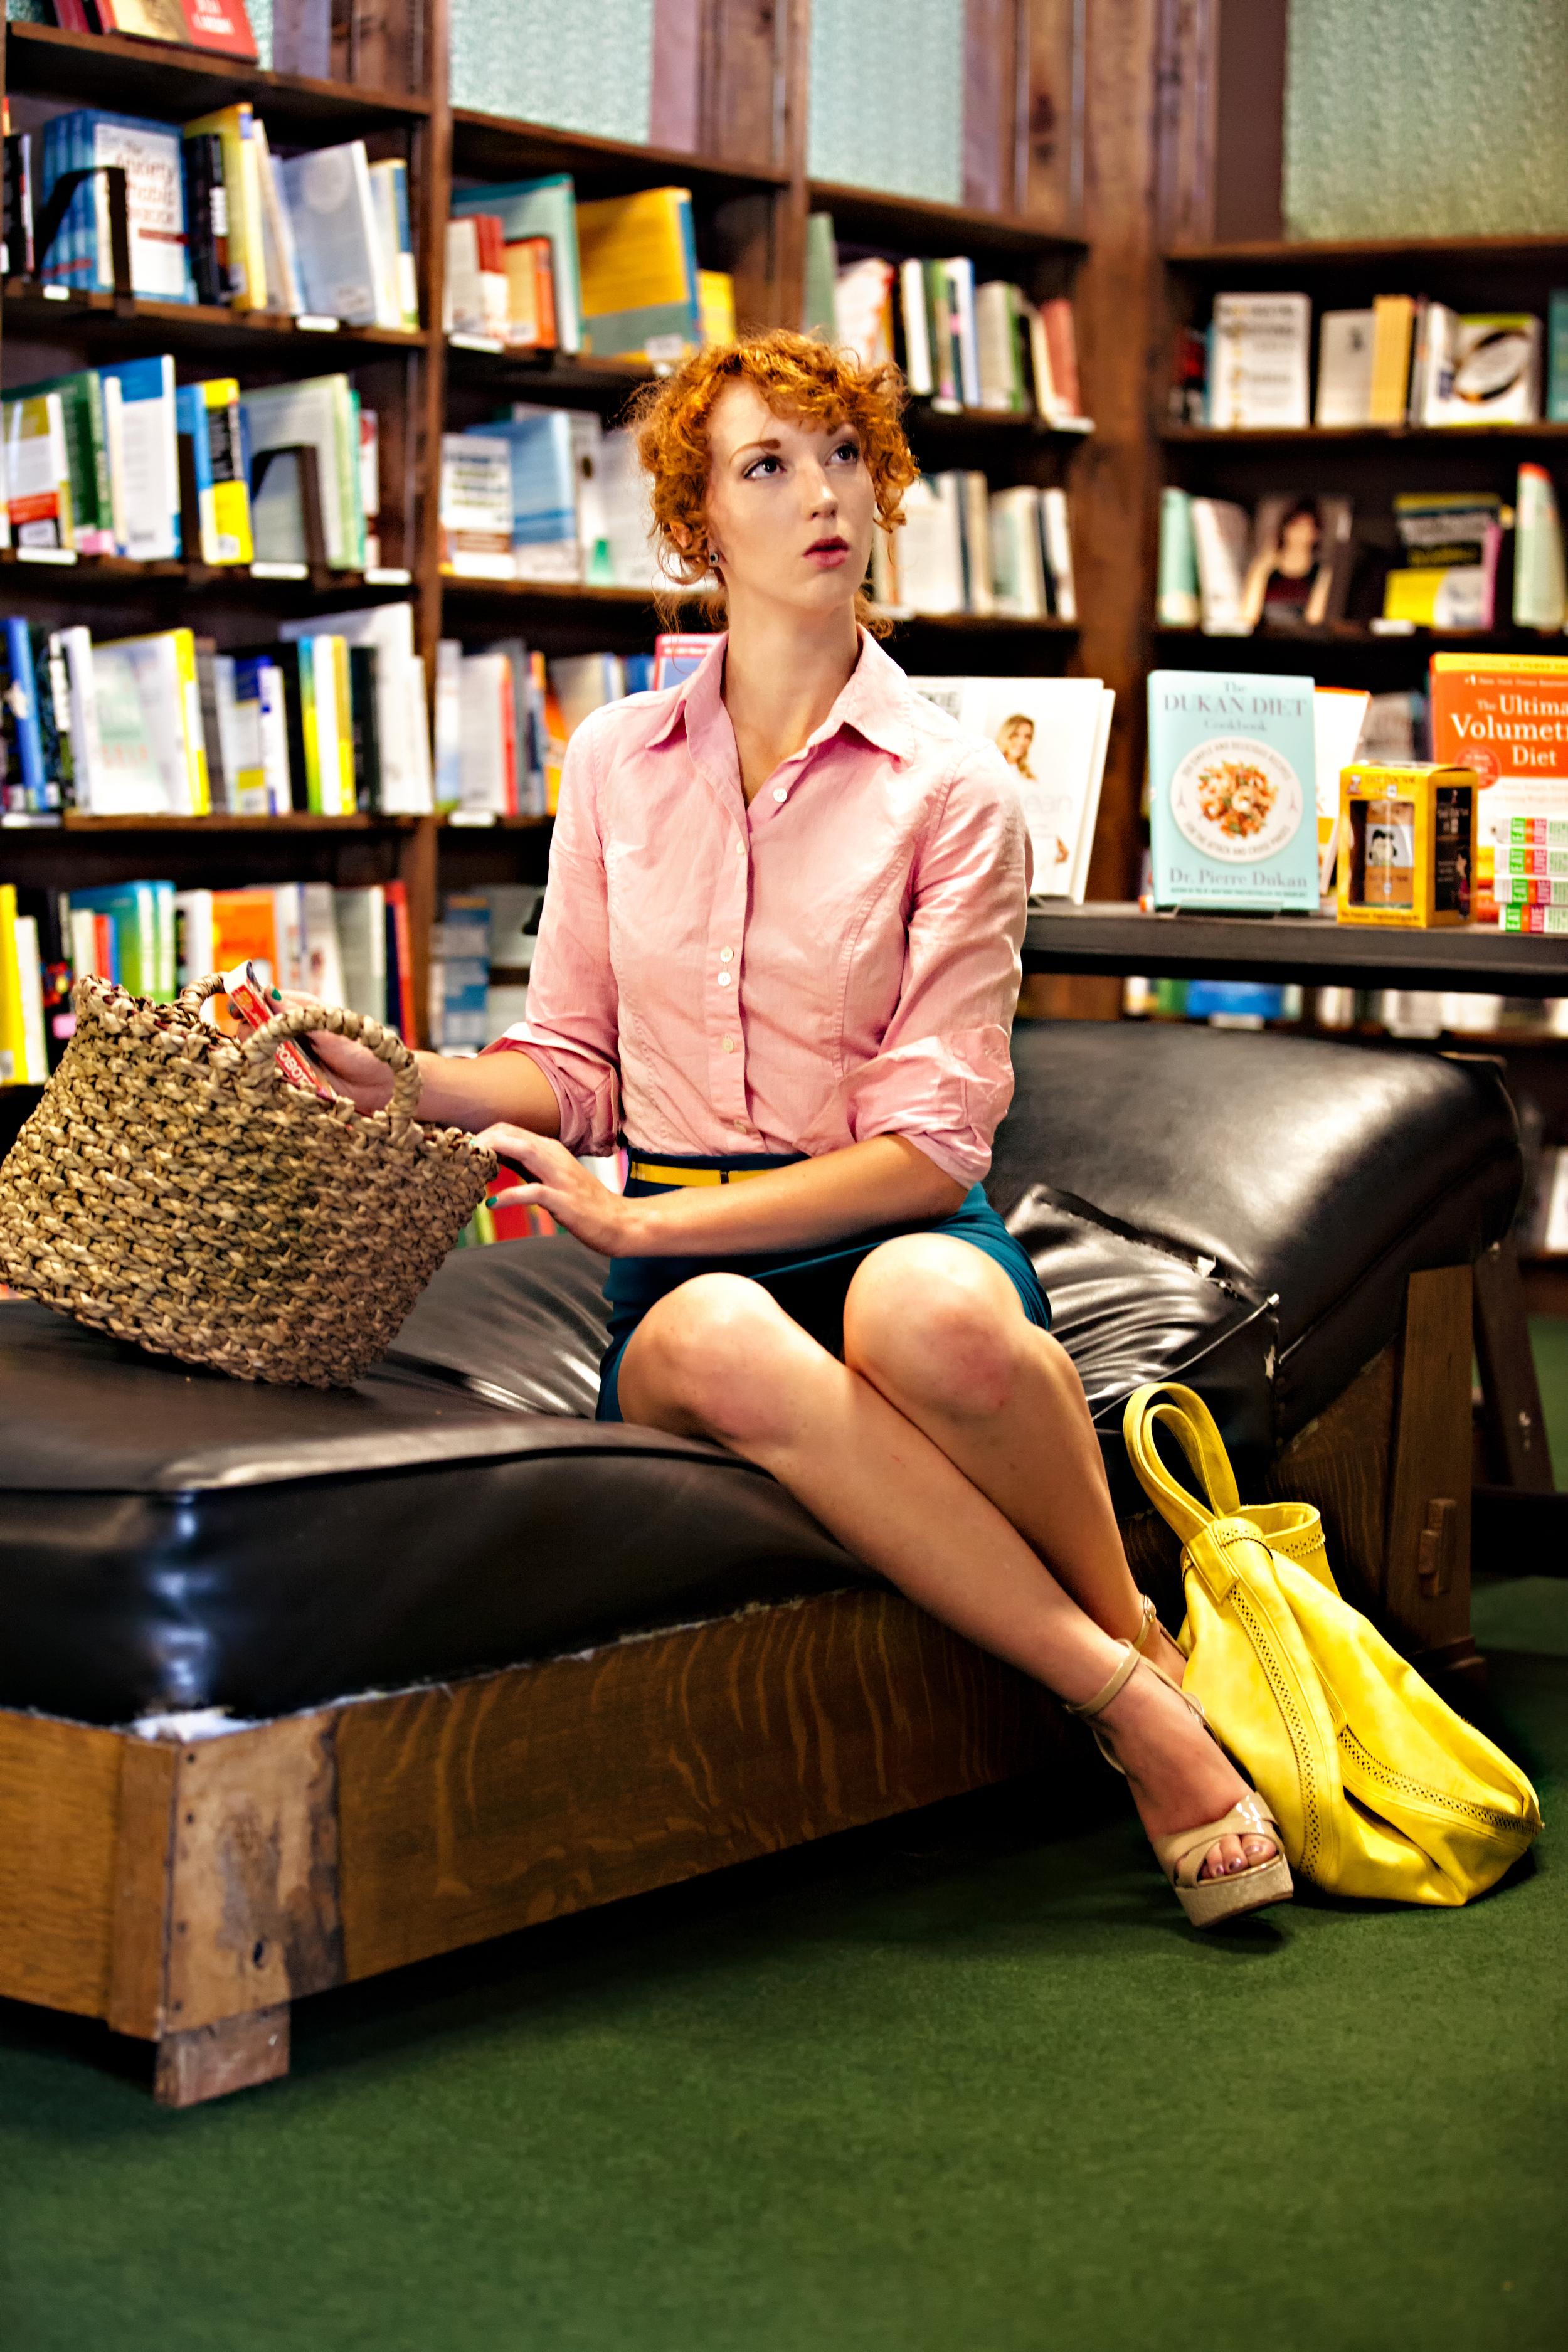 Photographer: Vidhi Thakur  Model: Liv Houser Location: Tattered Cover Book Store,  Denver, Colorado